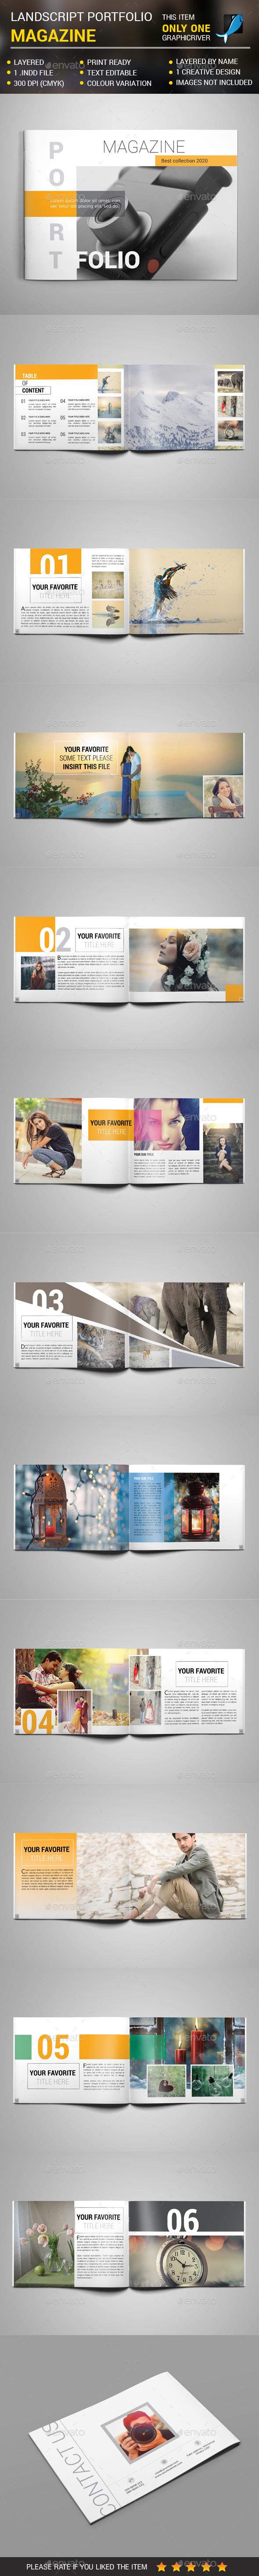 Landscape Portfolio Magazine - Magazines Print Templates